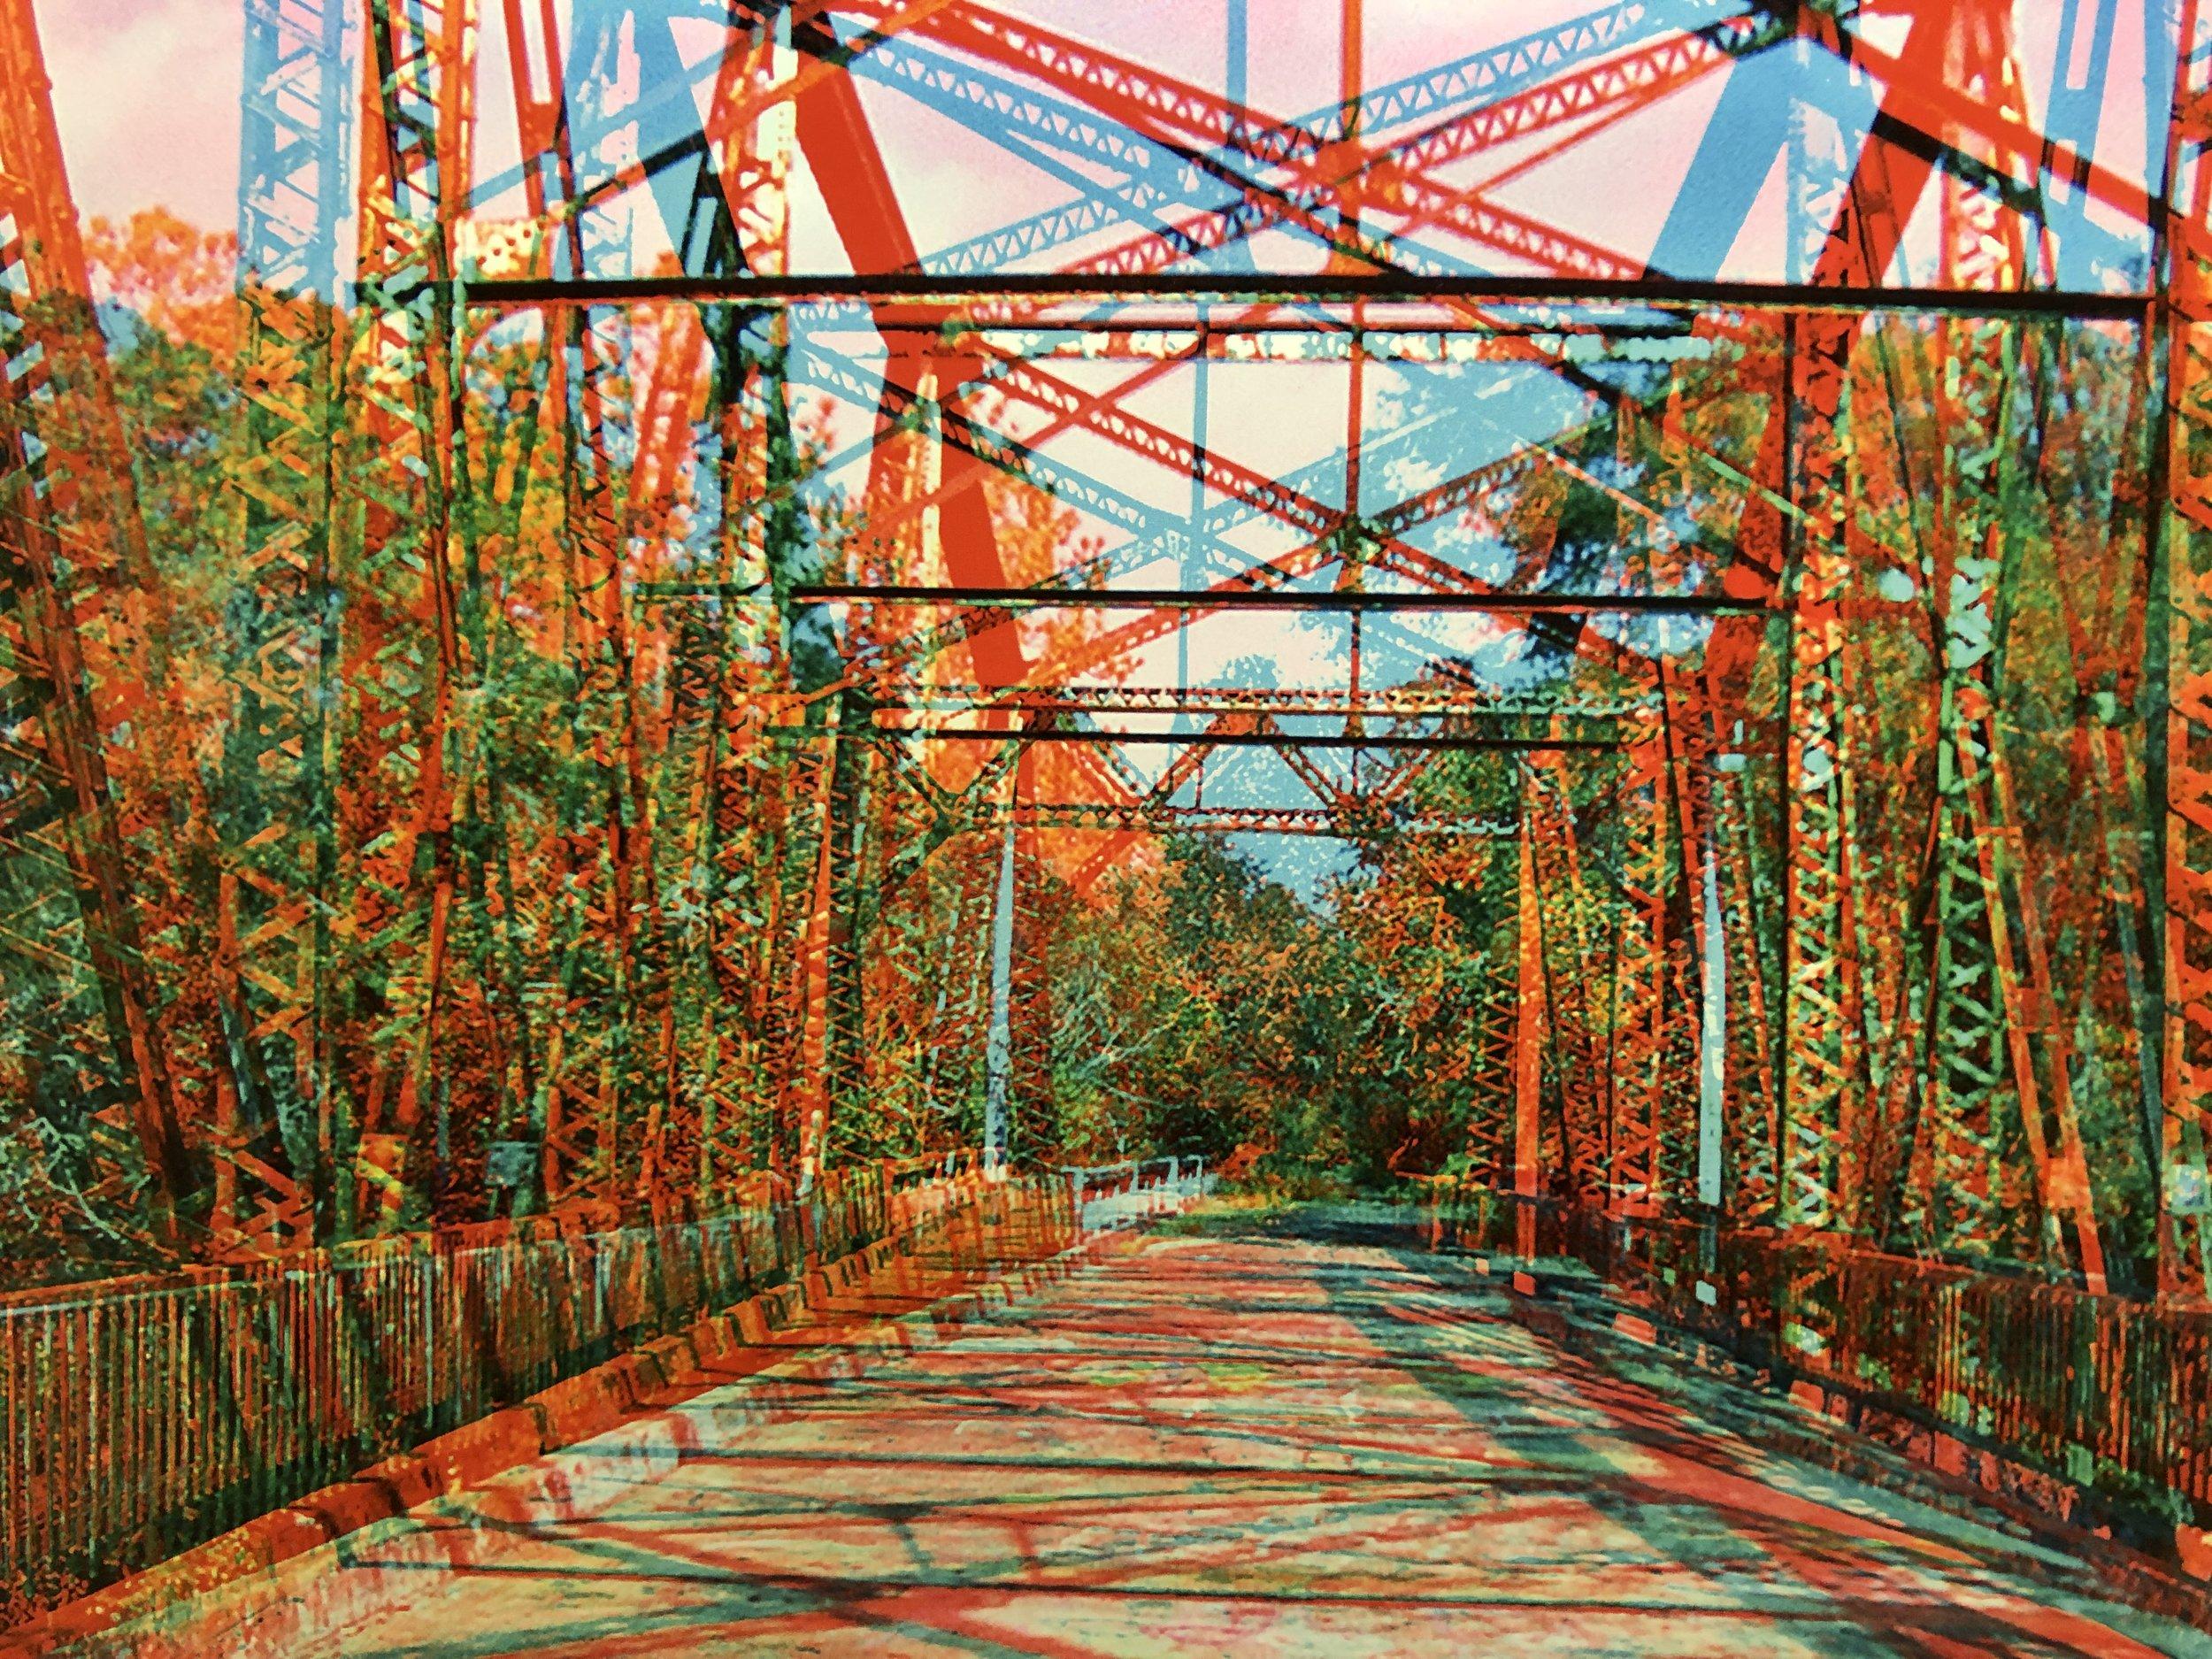 Abandoned Passage, Suwannee Springs Bridge, Live Oak, FL 2004 - Jim McManus